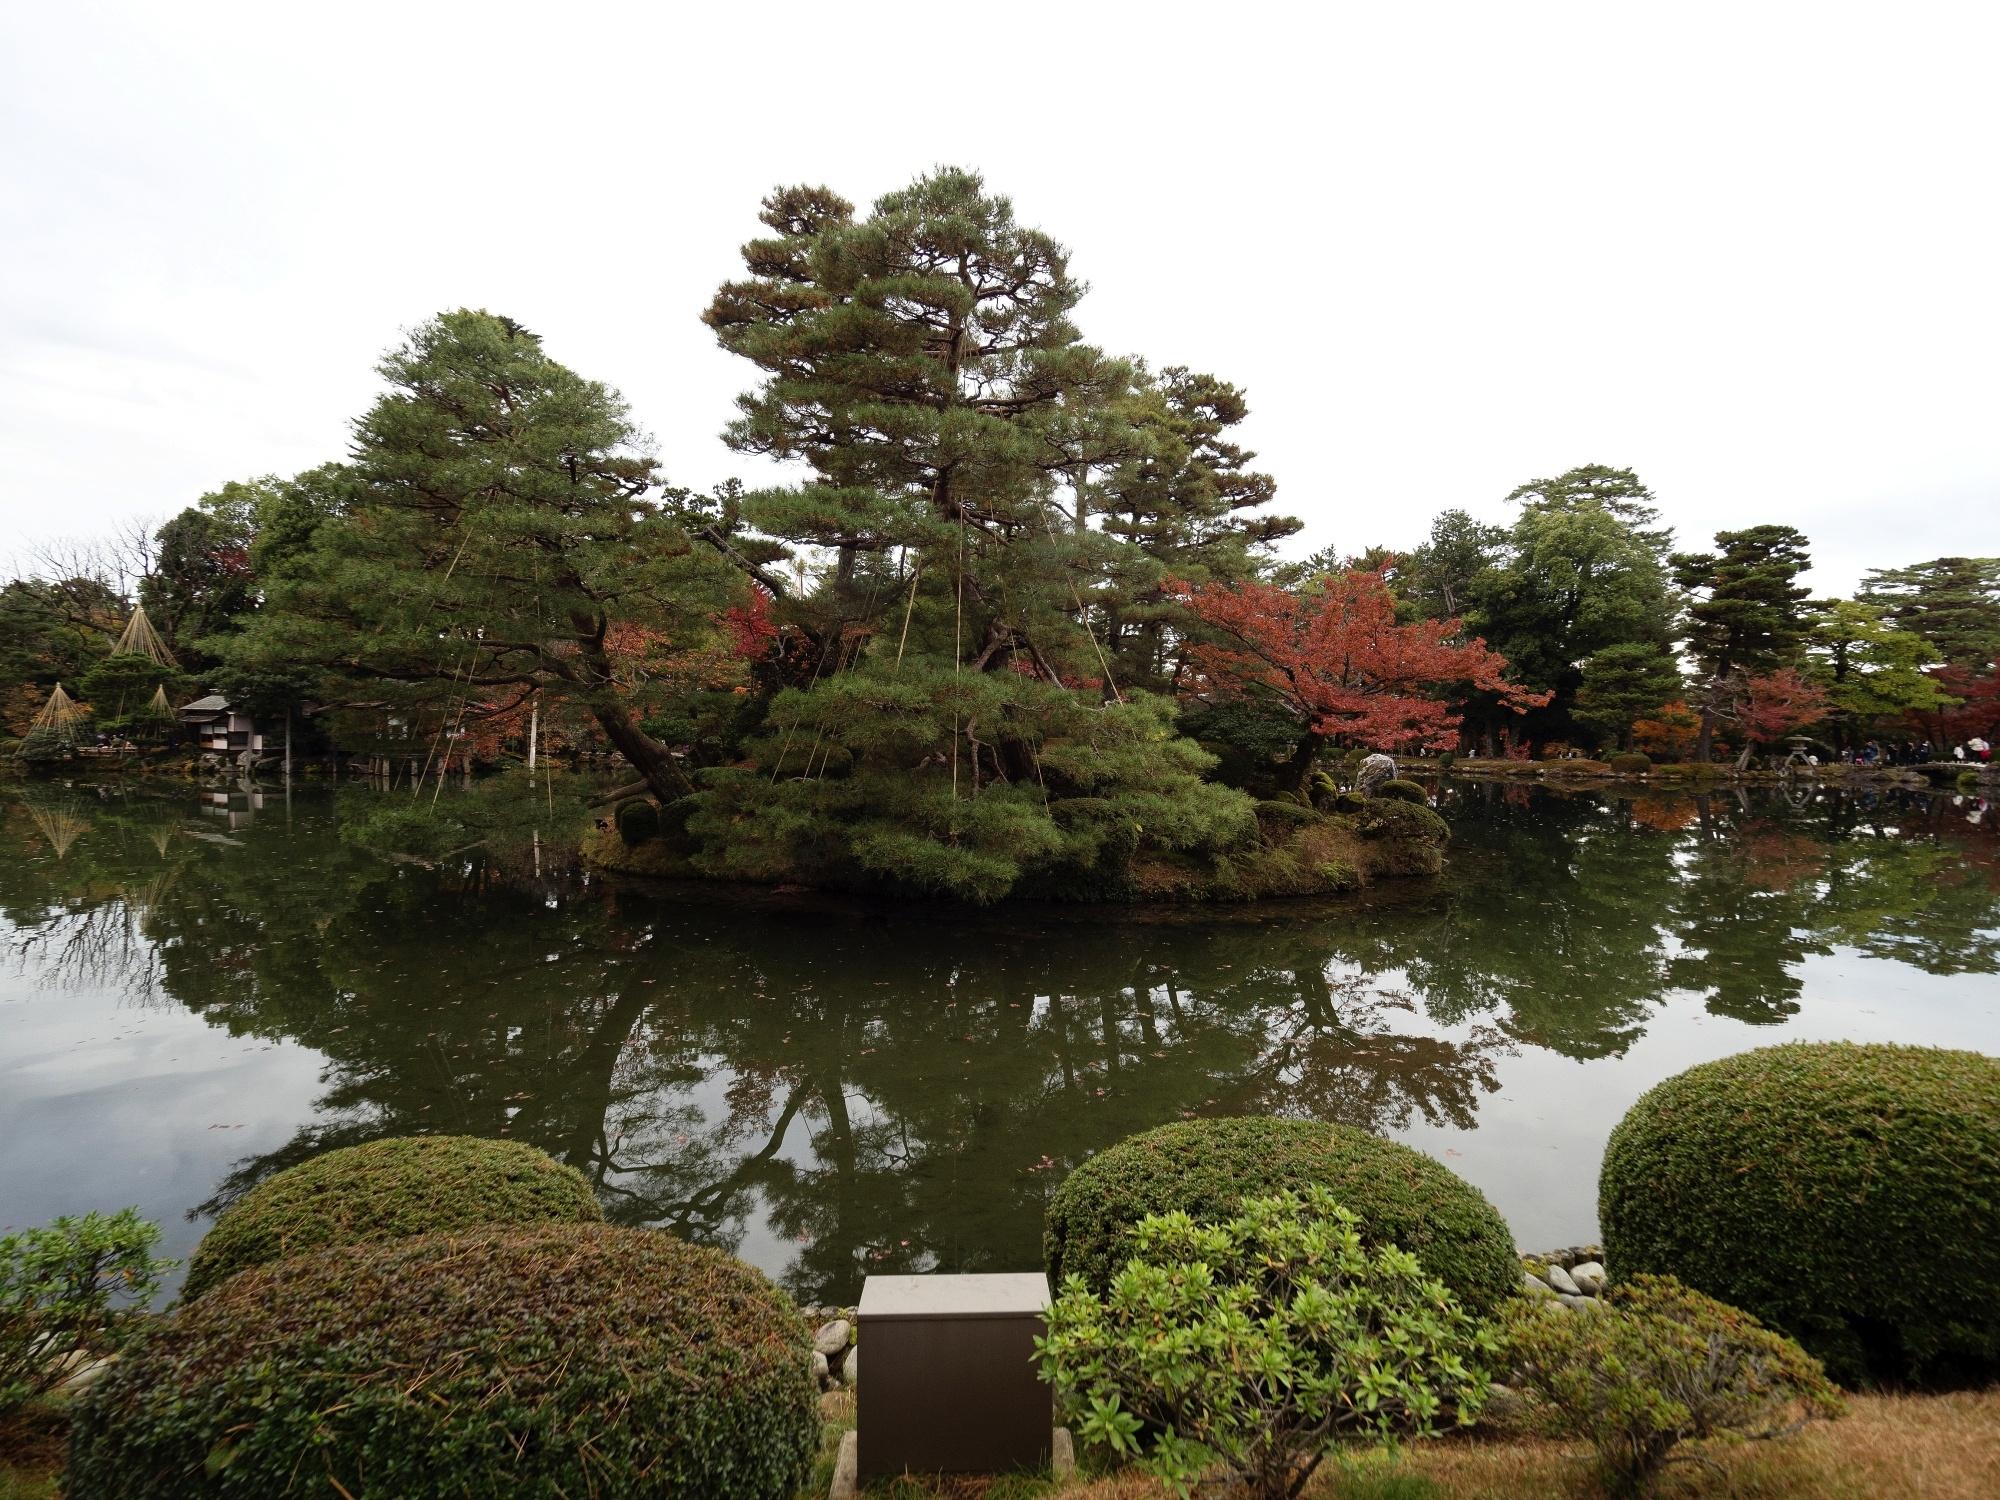 JAPÓ - COLORS DE TARDOR - agusti lopez rodriguez i agusti meseguer altes, Fotografía entorn natural